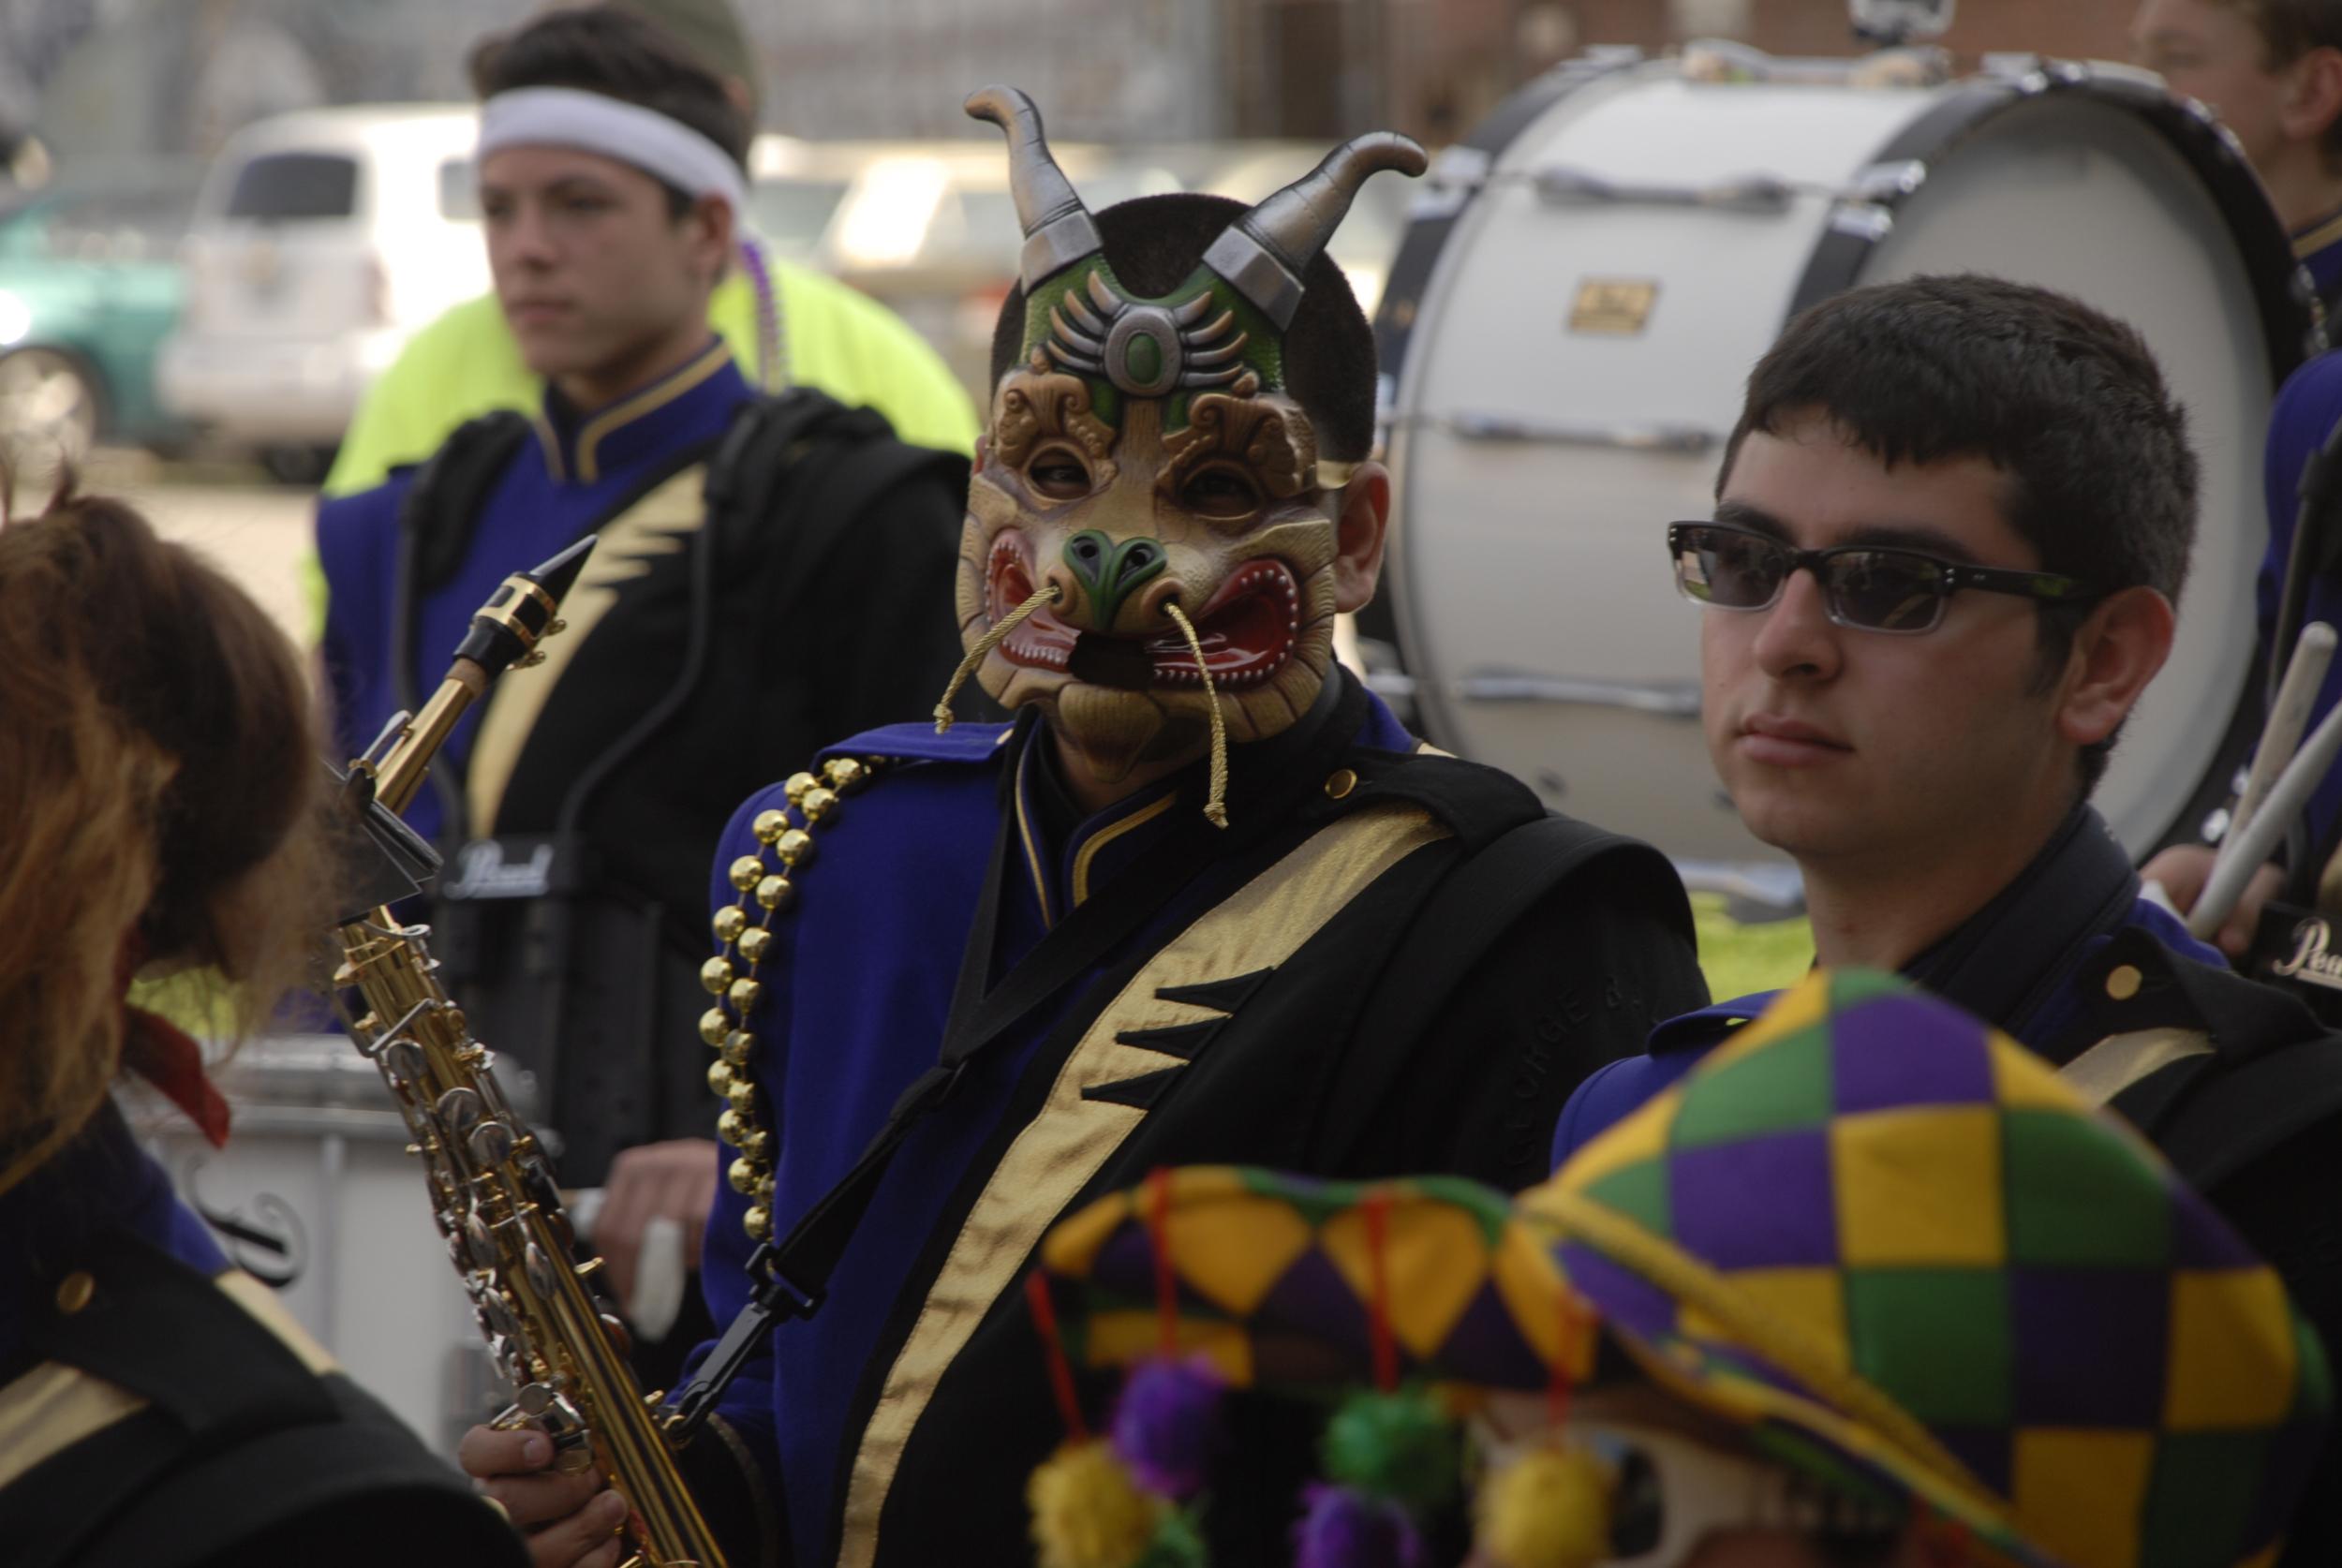 Mardi Gras parade in Galveston, TX